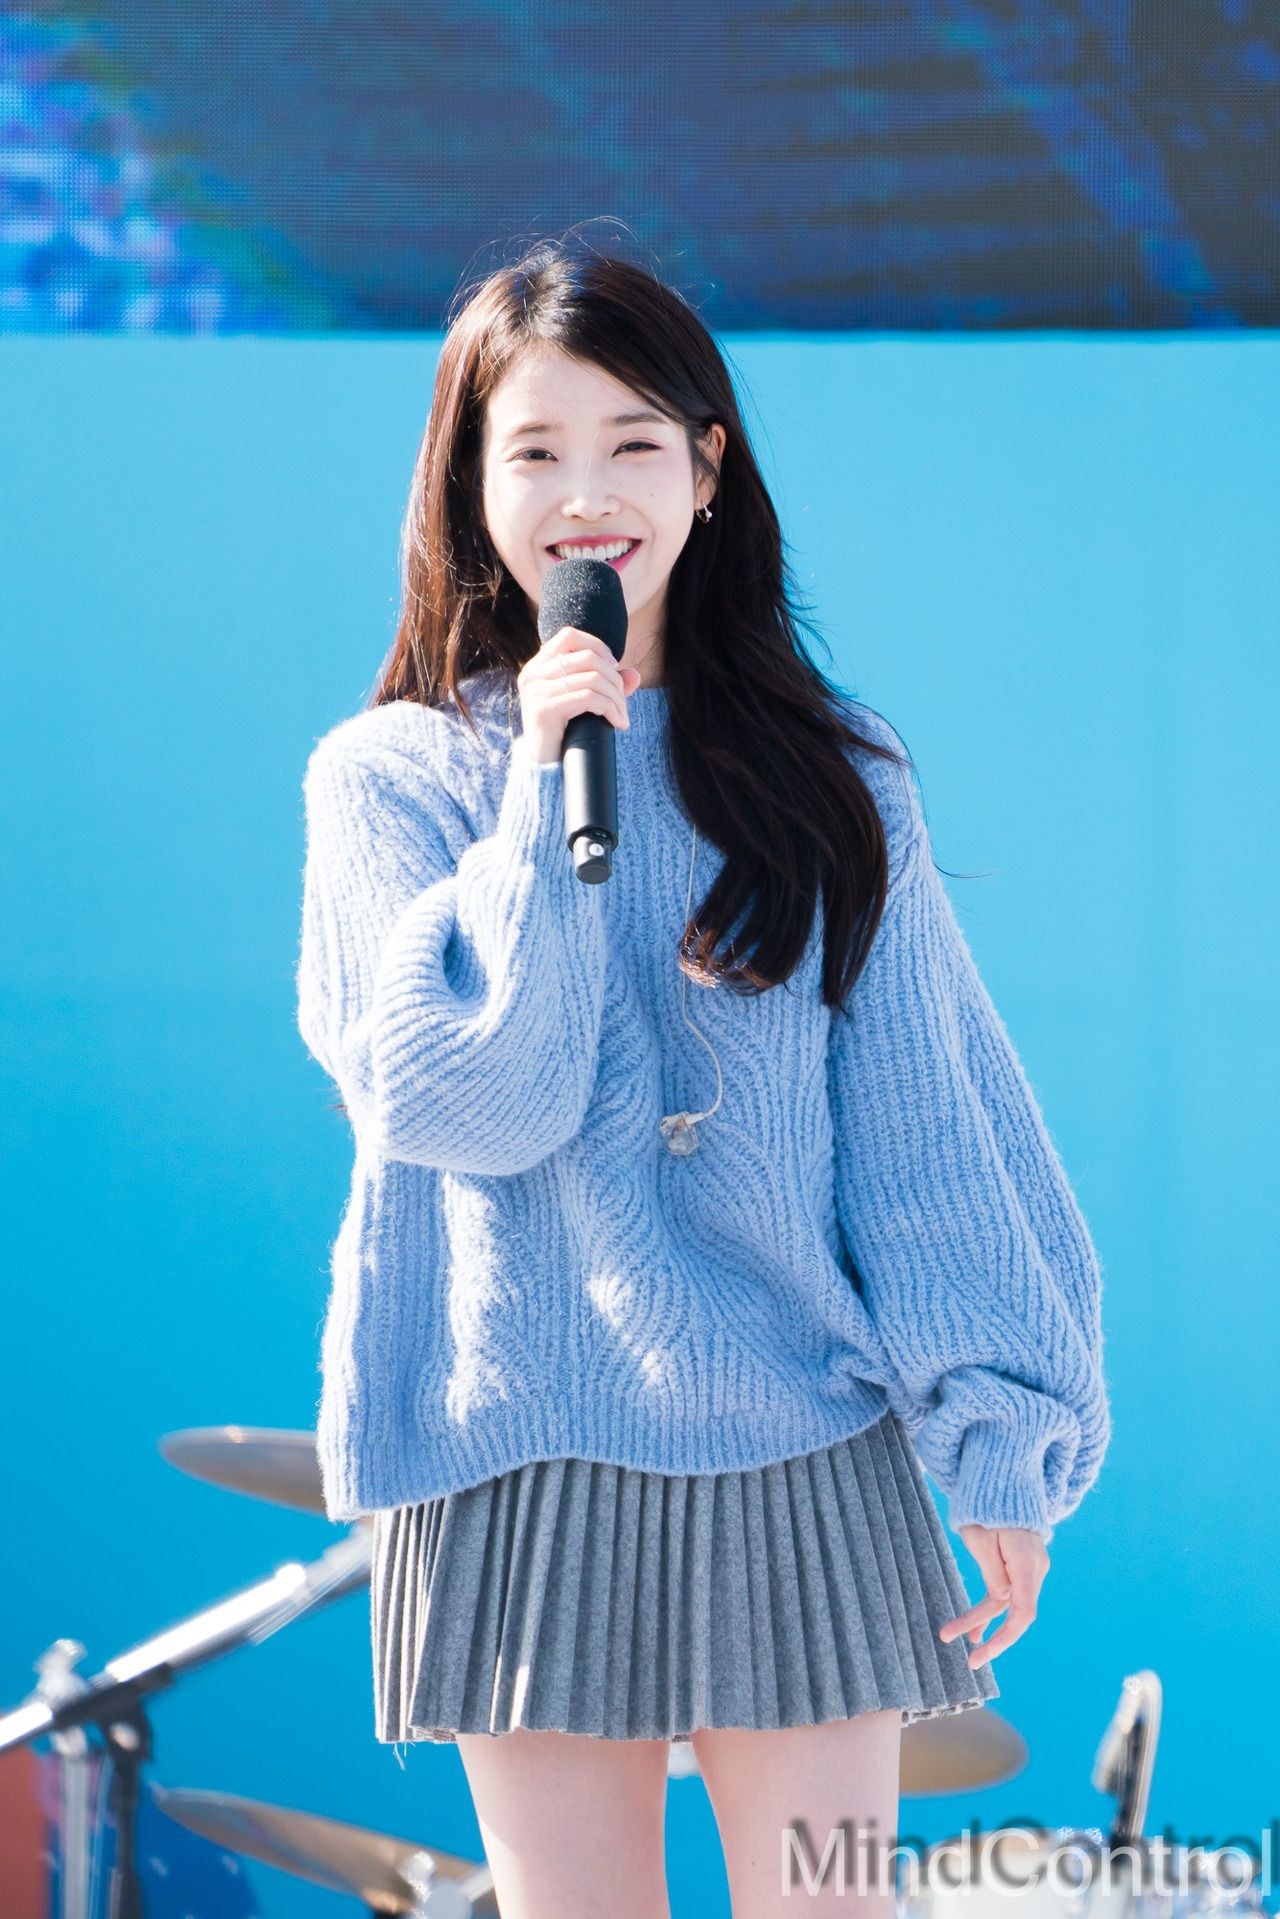 180930 Iu At Holgabun Market Festival By Mindcontrol Iu Korean Celebrities Korean Actors Actors Actresses